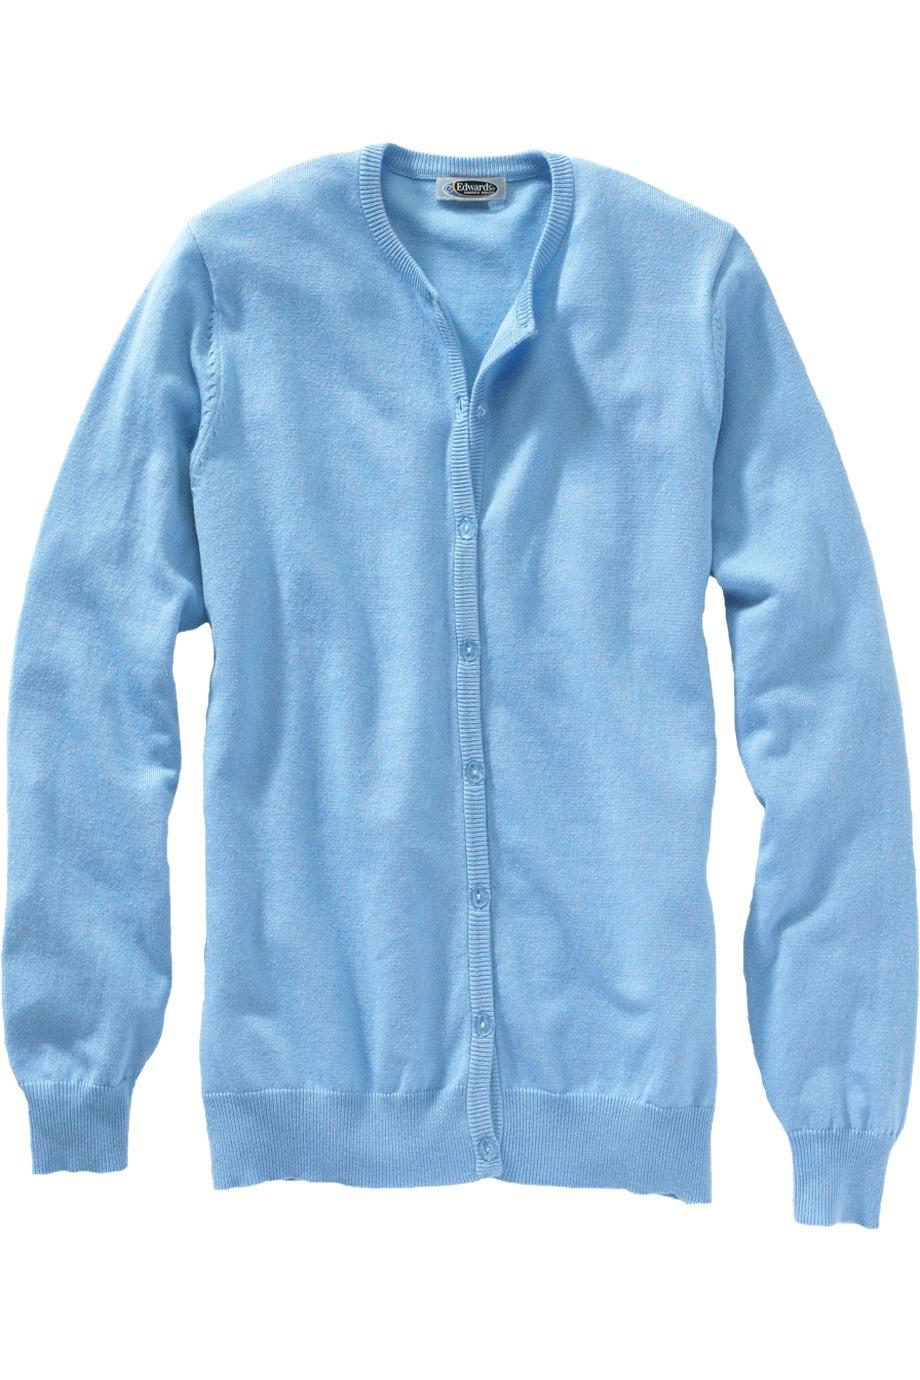 Edwards Garment 040 女士舒适开襟羊毛衫